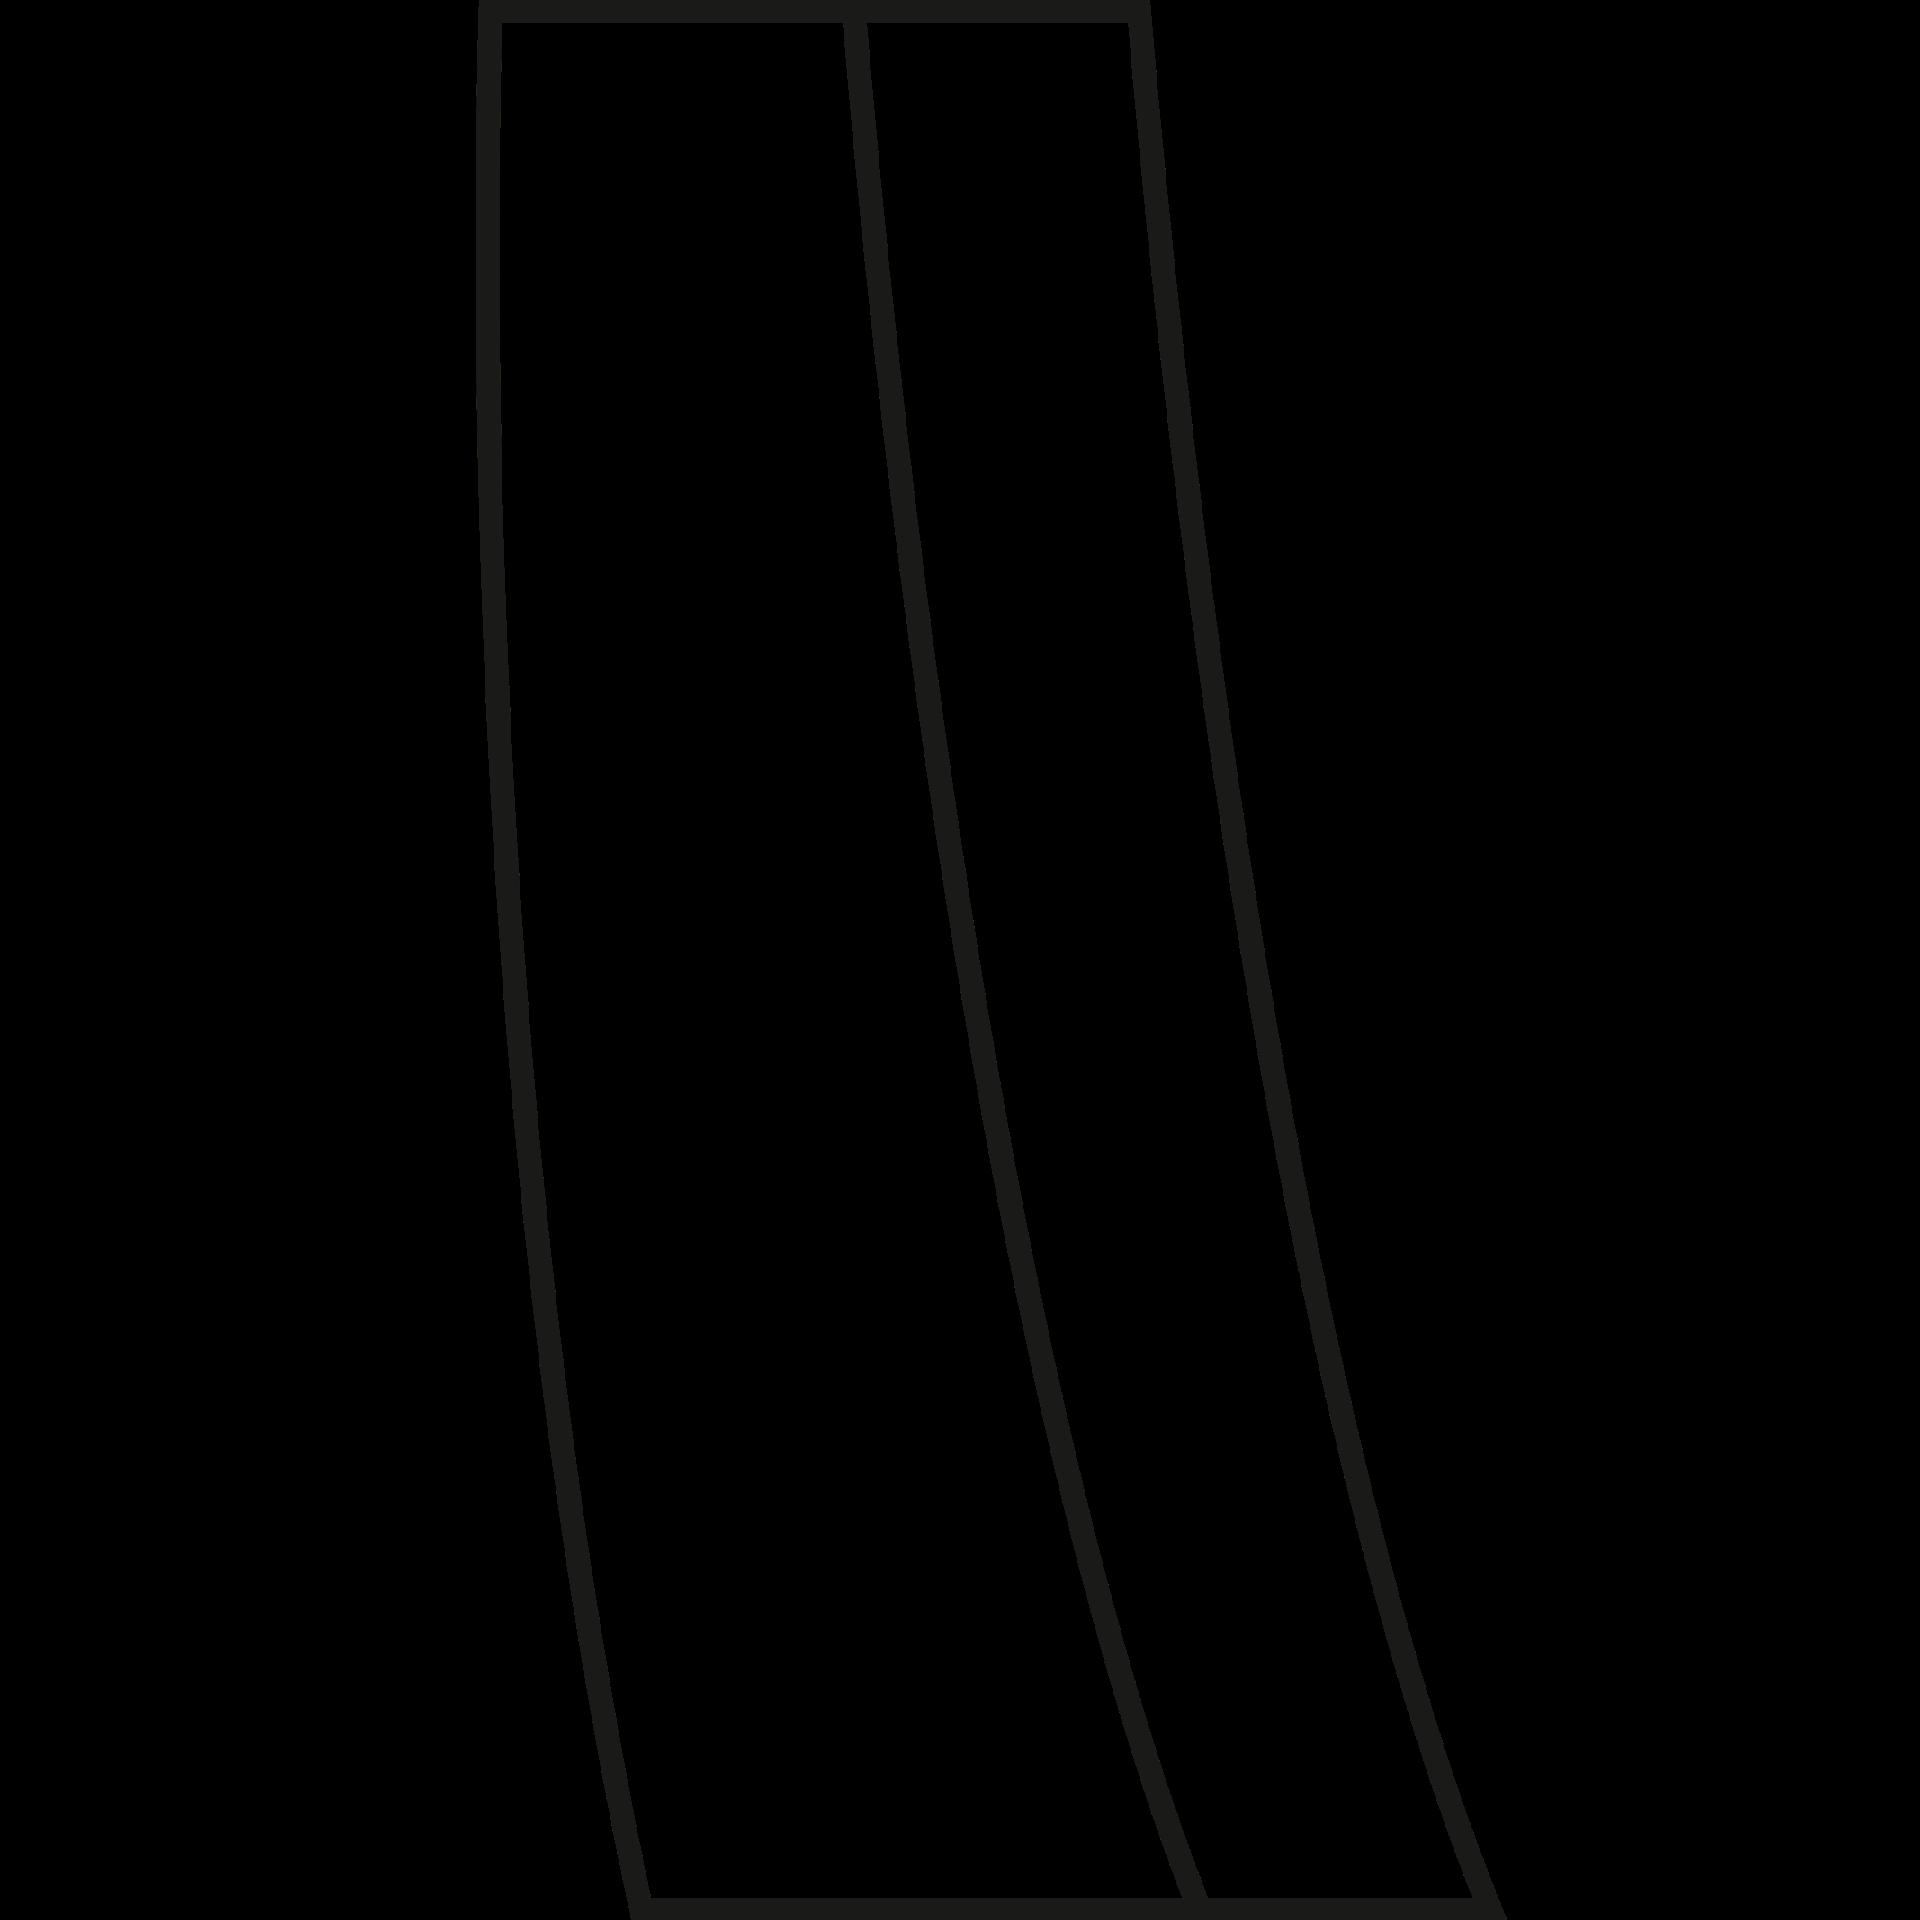 mk-dent-icon-classic-line-body-black